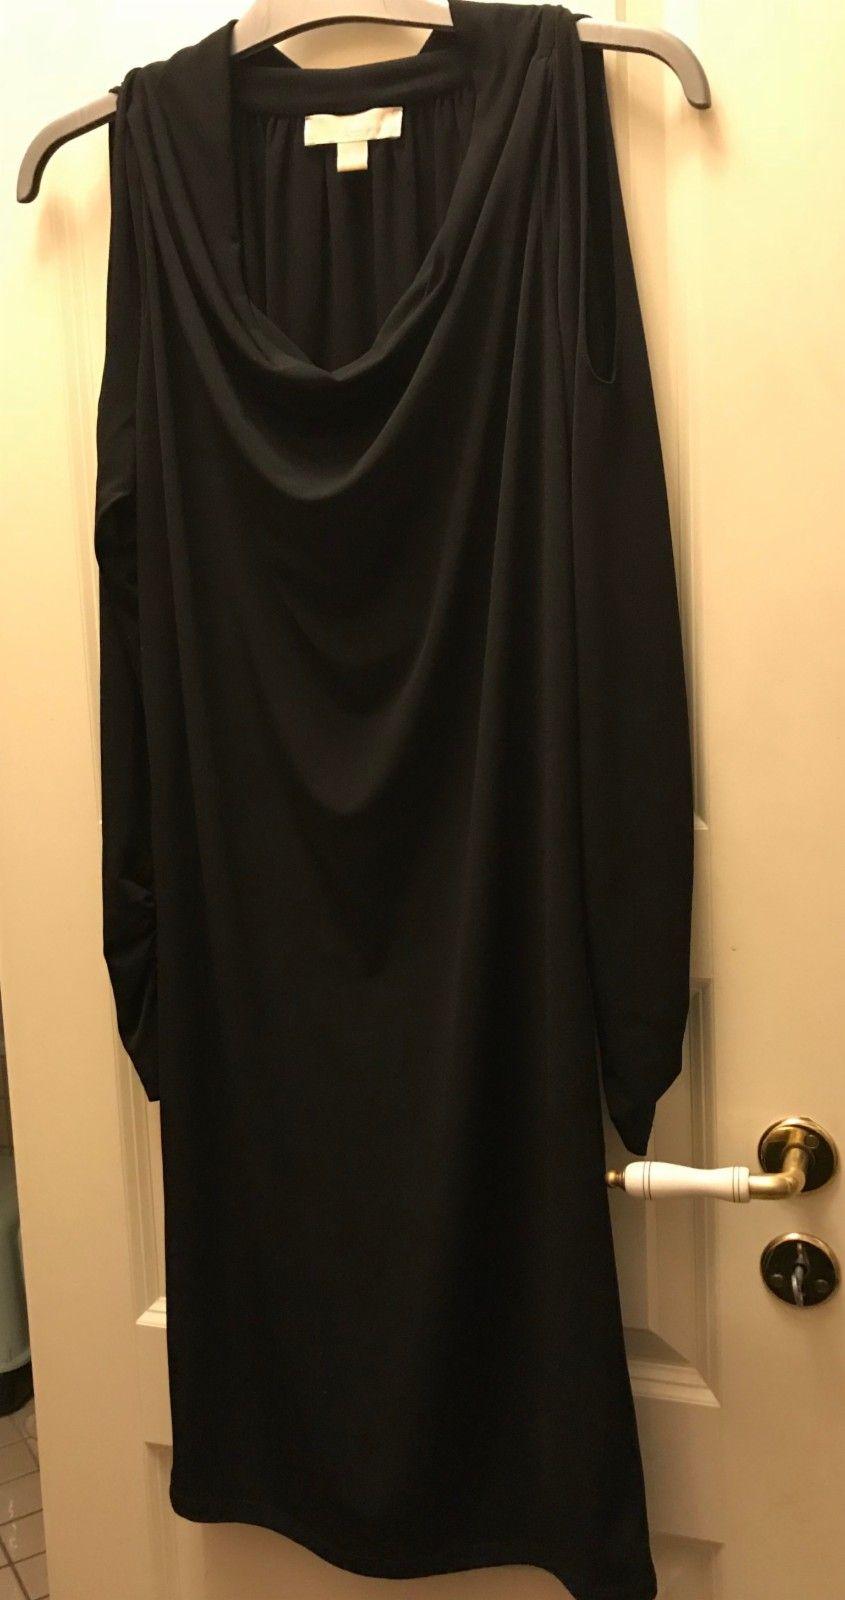 Michael Kors kjole med åpen skulder sort | FINN.no